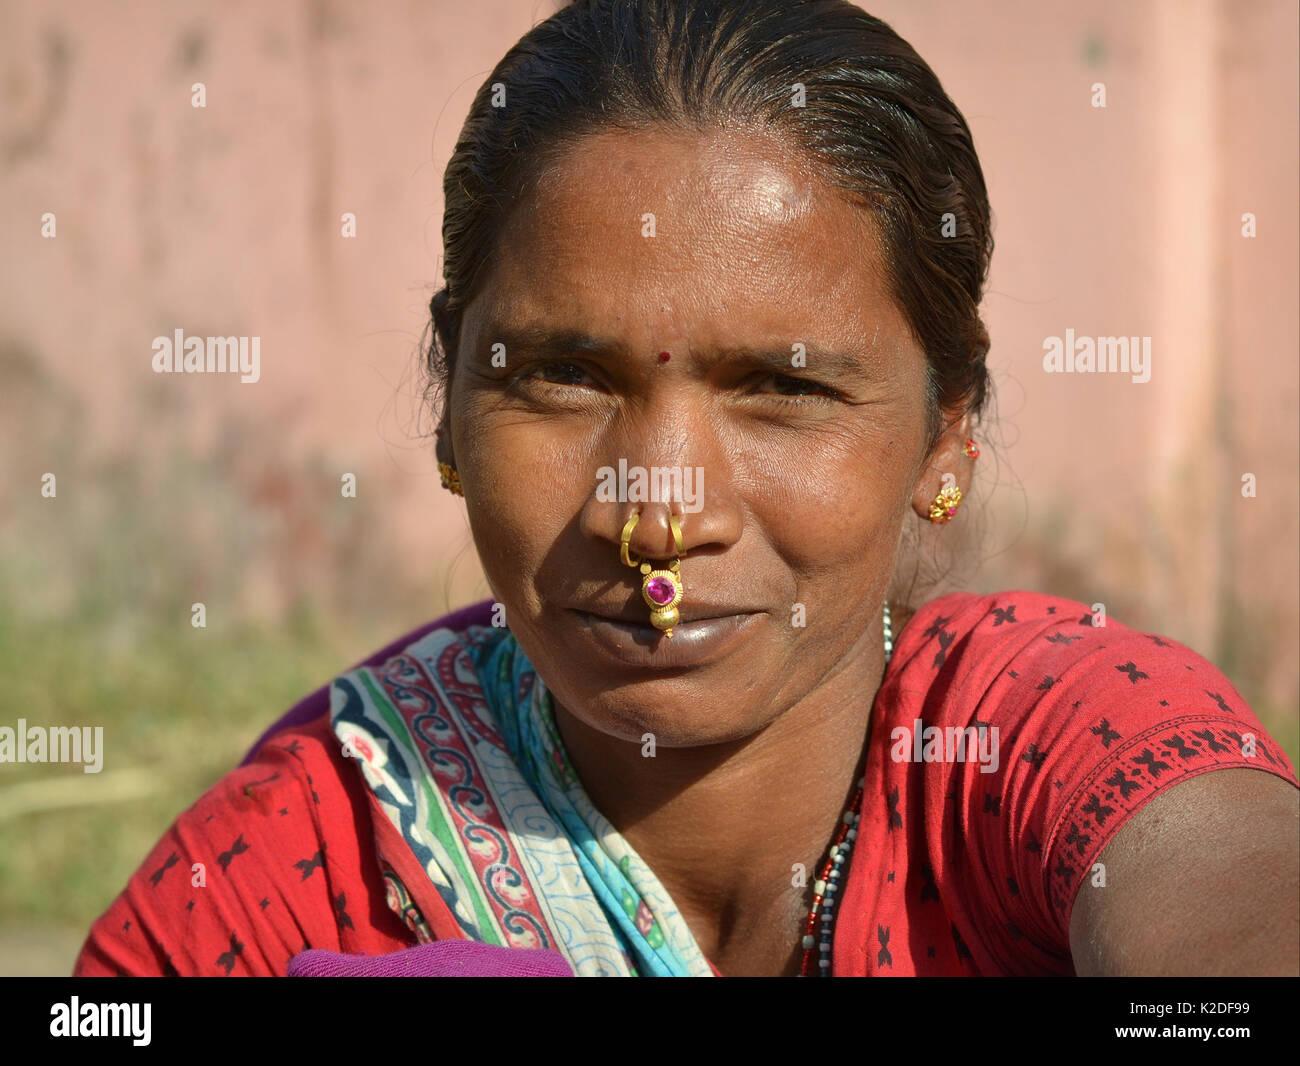 Adivasi Stock Photos & Adivasi Stock Images - Alamy